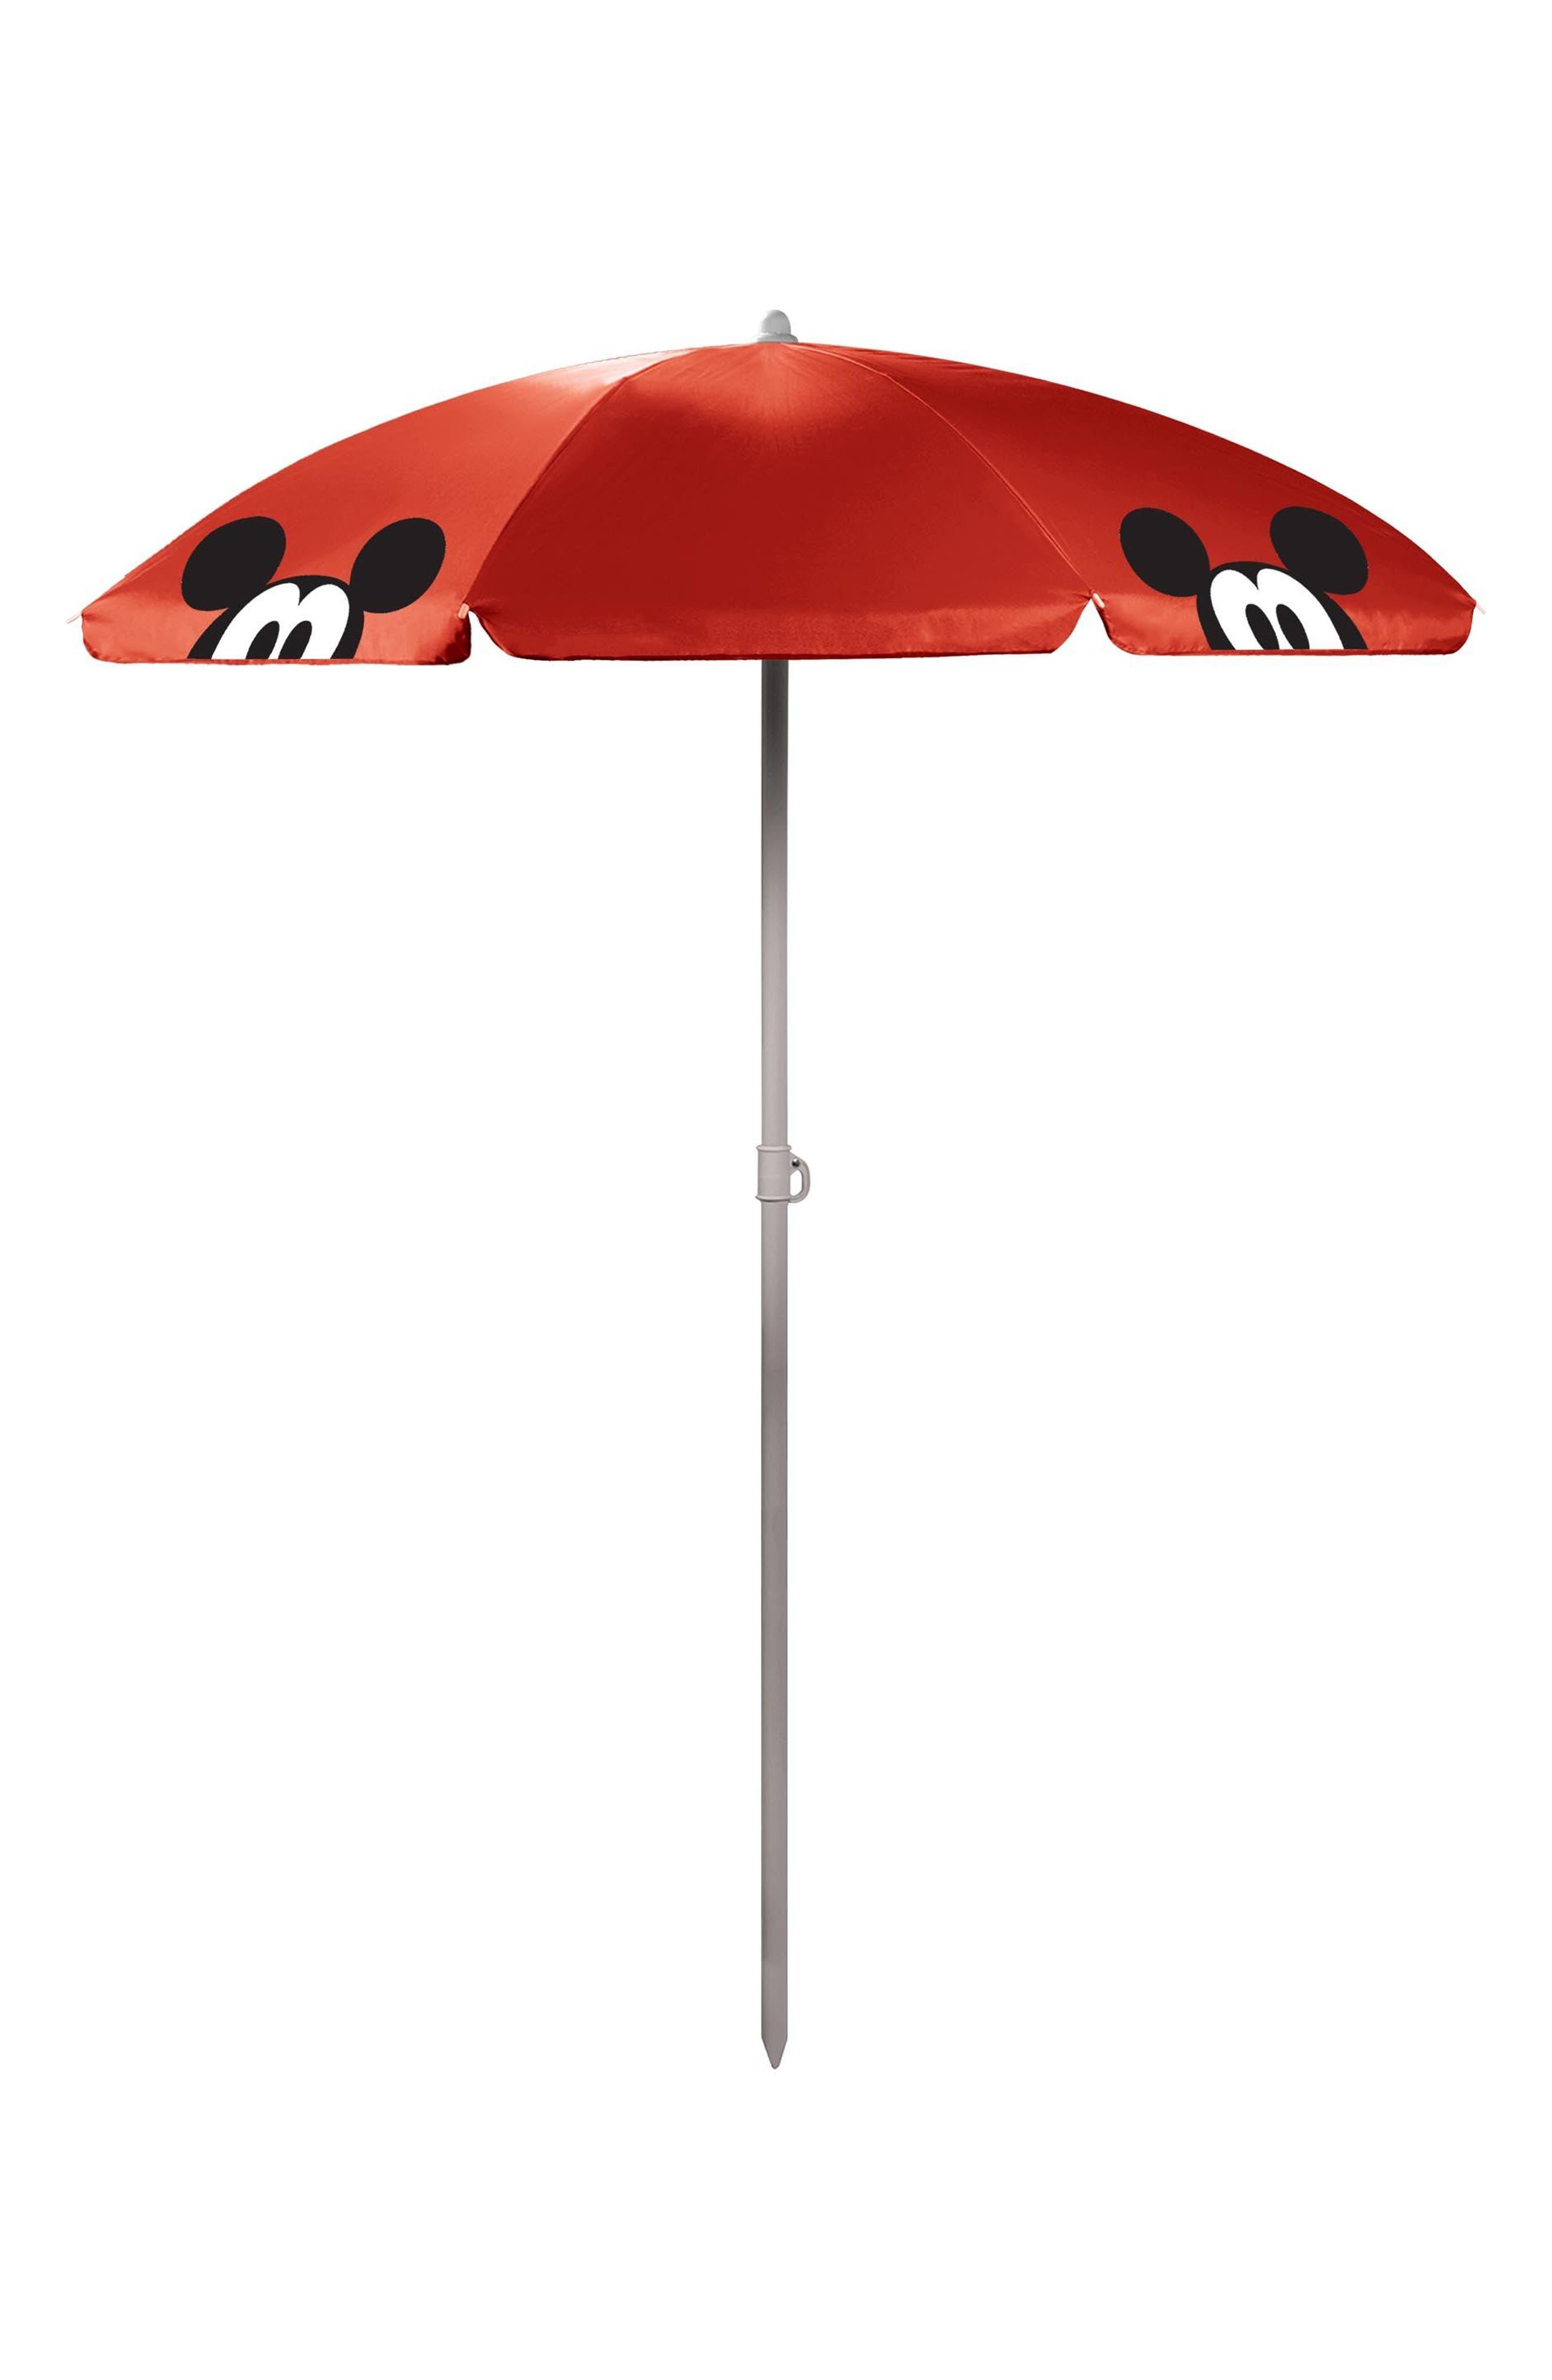 Disney<sup>®</sup> Mickey Mouse Portable Beach & Picnic Umbrella,                             Main thumbnail 1, color,                             Mickey